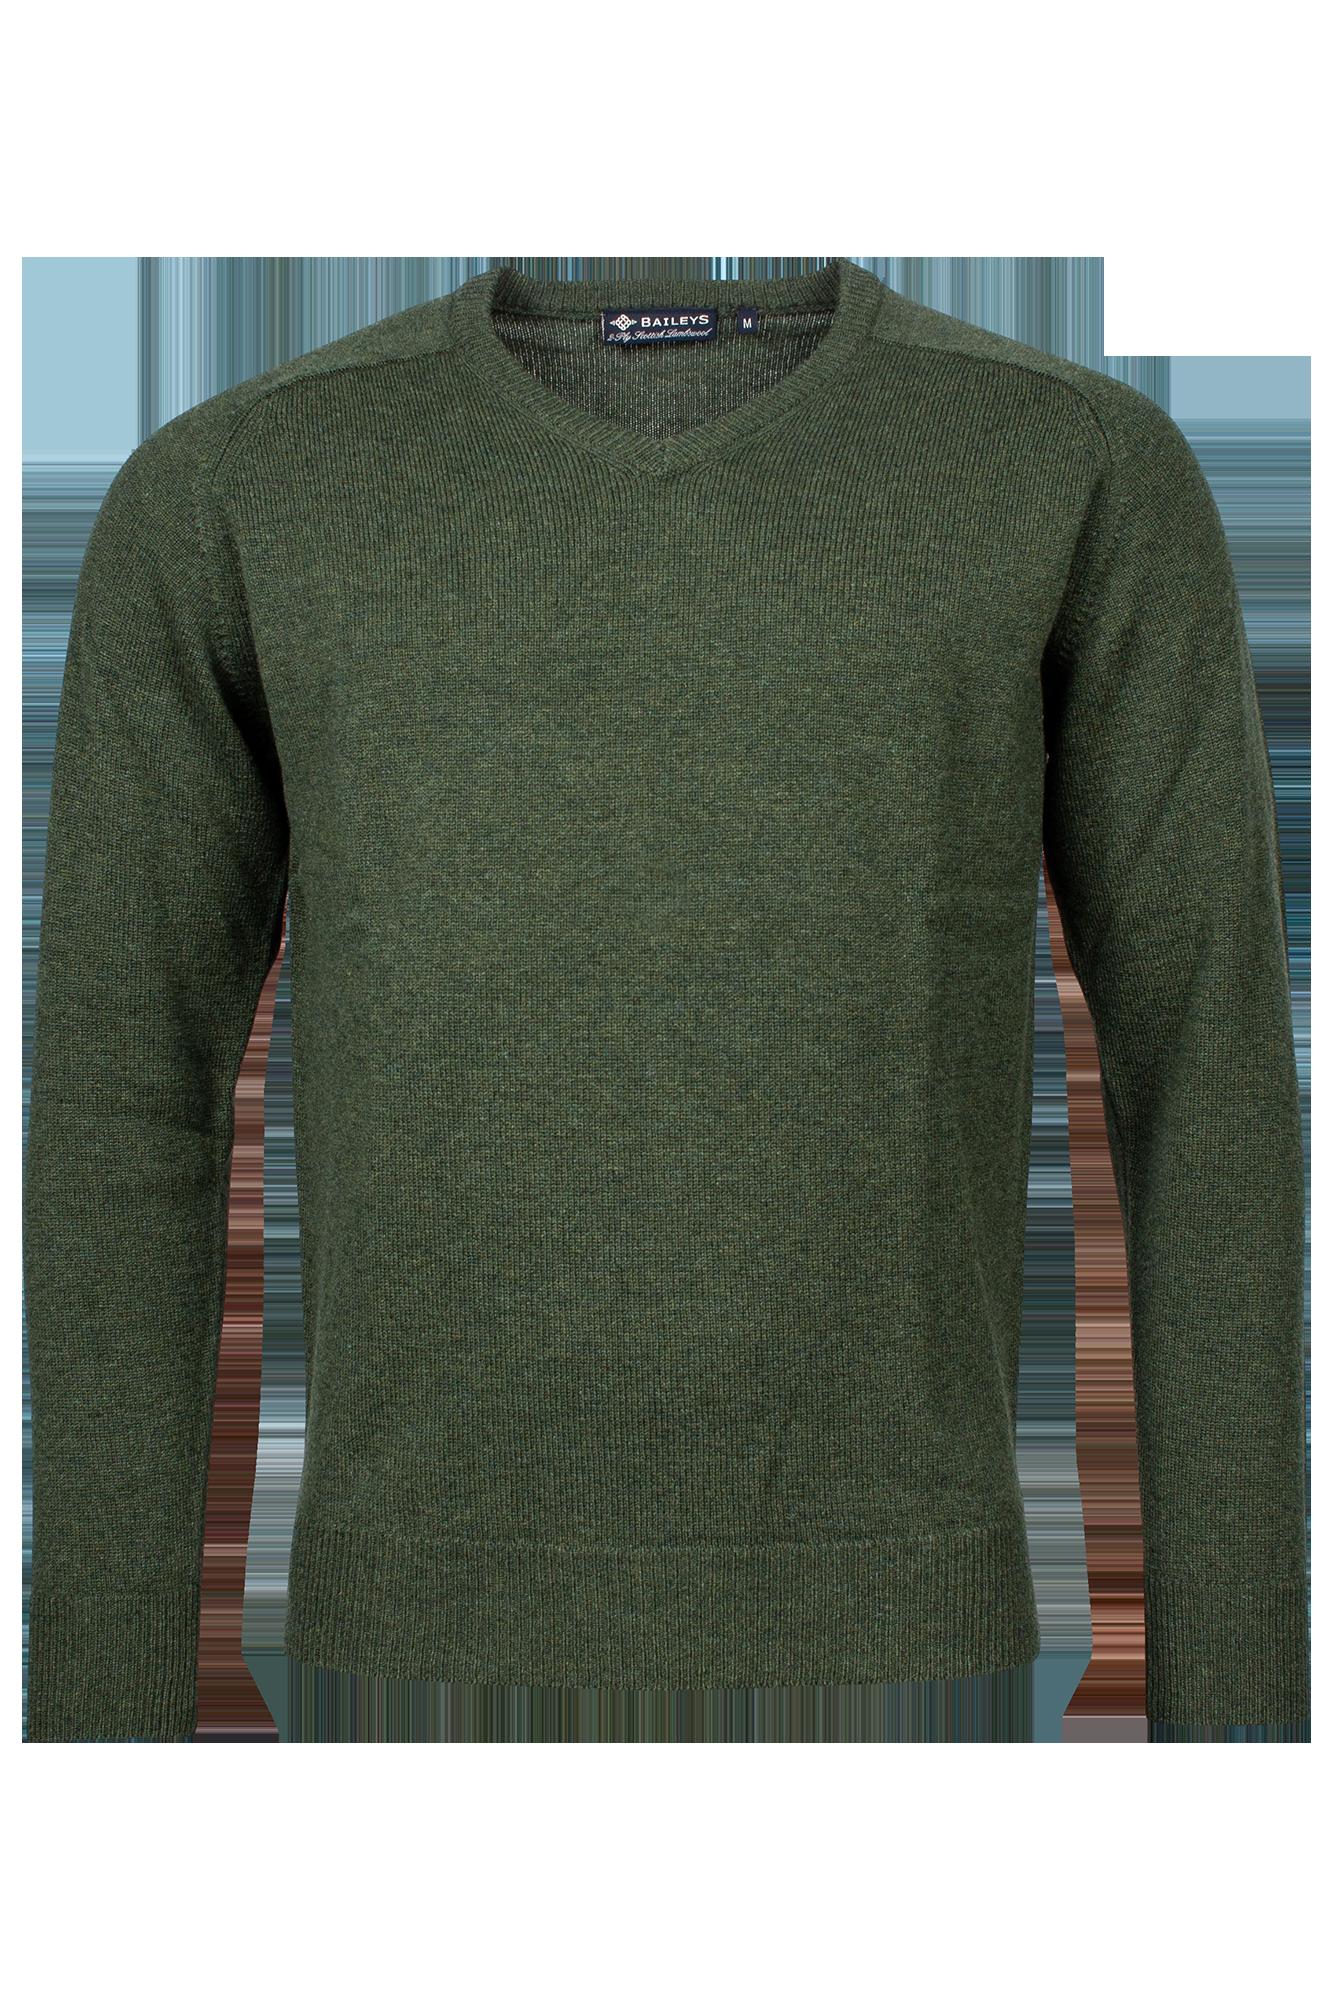 Baileys lamswollen pullover, v-hals, groen